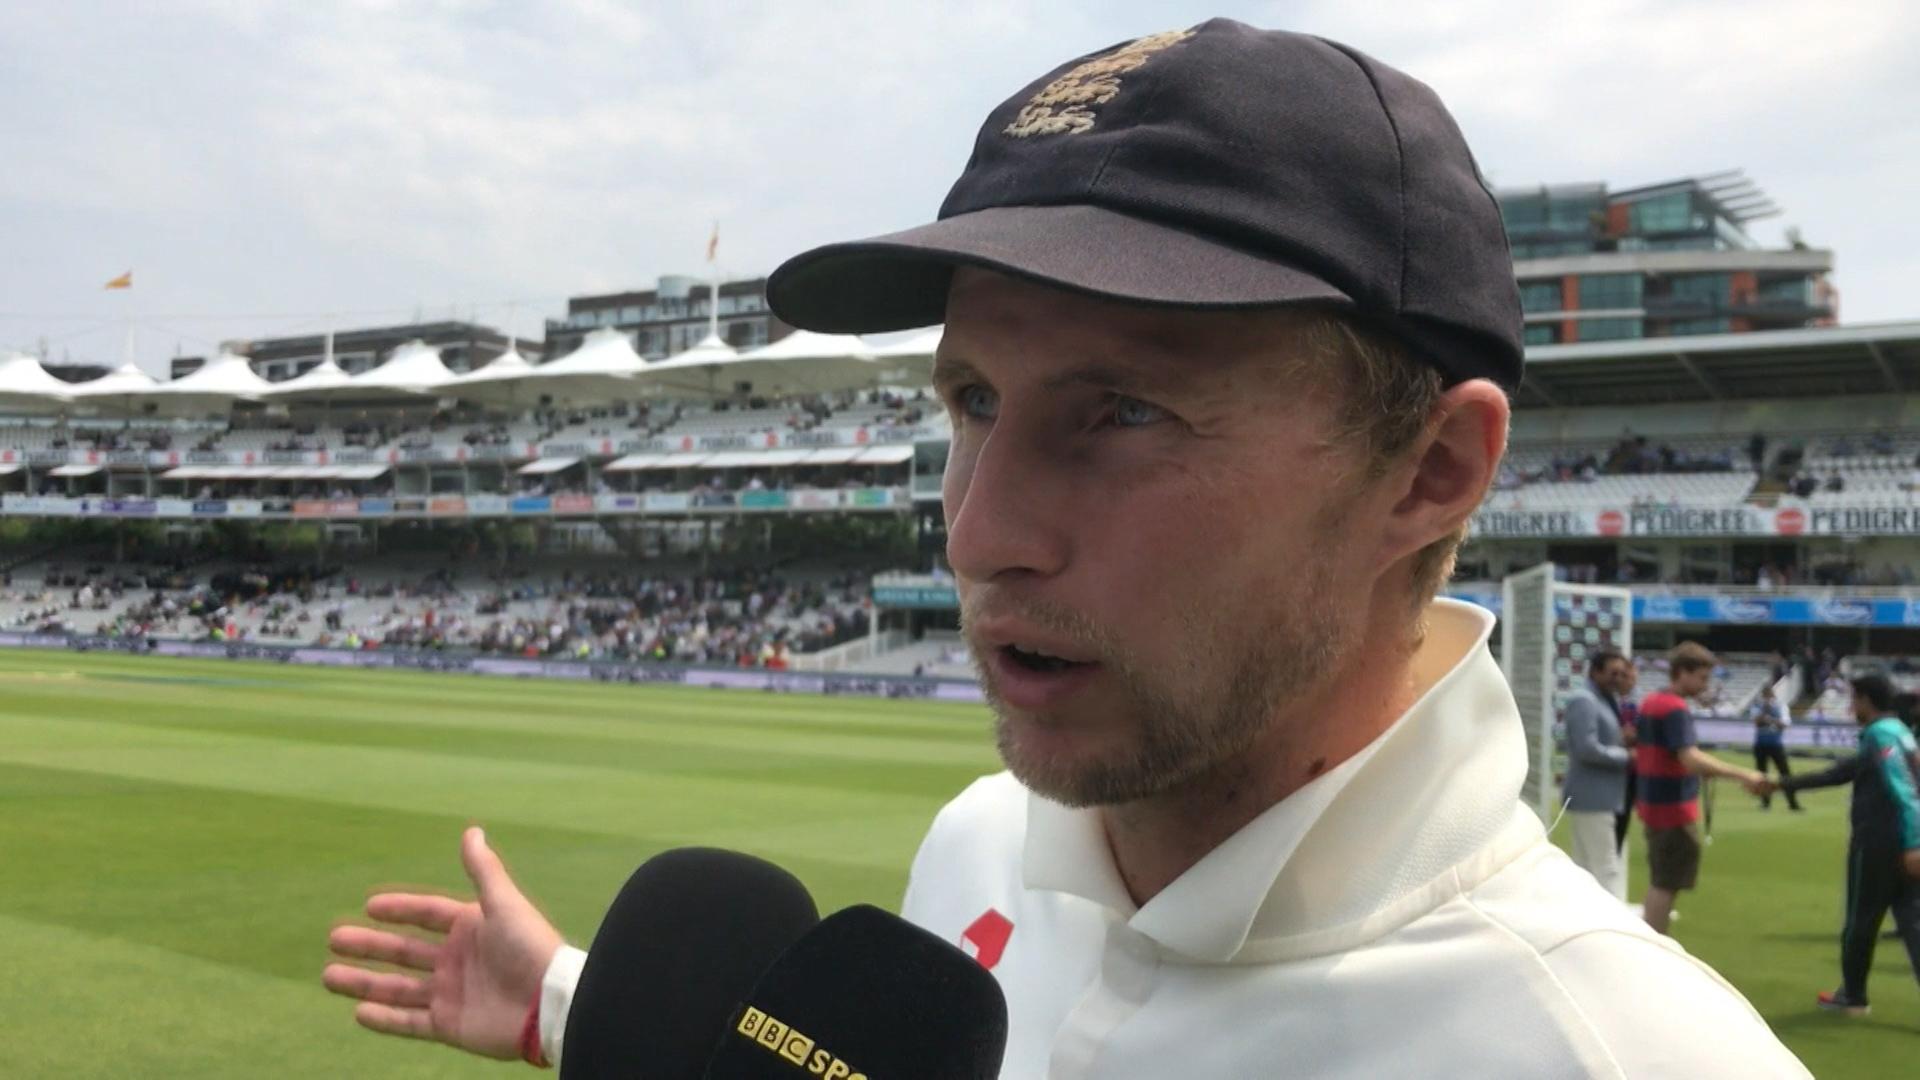 England v Pakistan: Joe Root - Team have got to be smarter